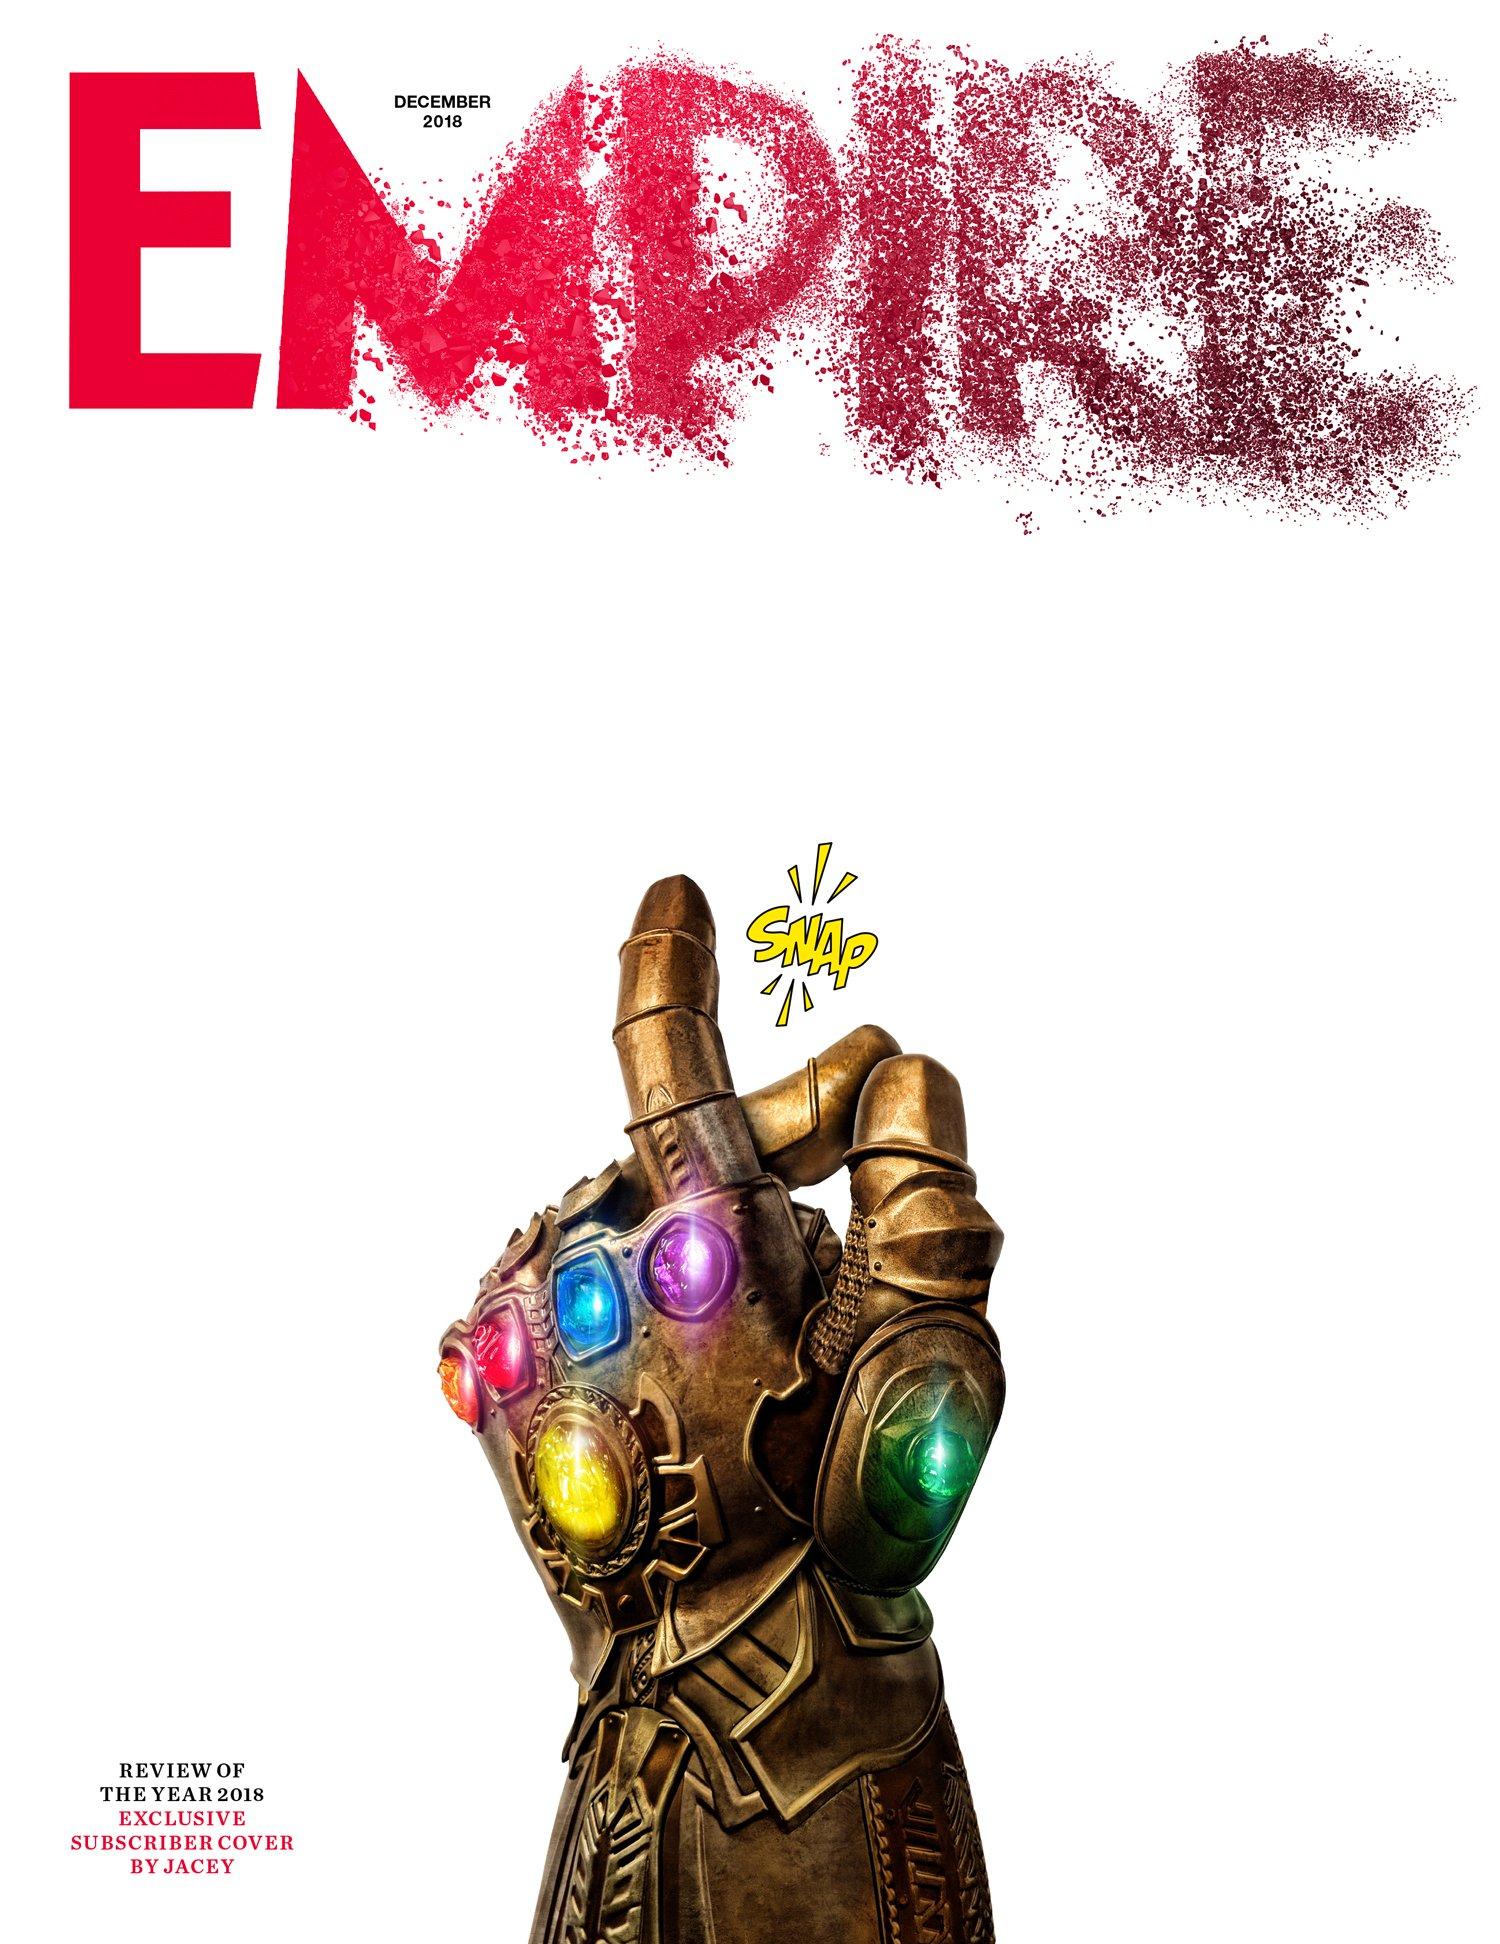 Portada de Empire dedicada a Avengers: Infinity War